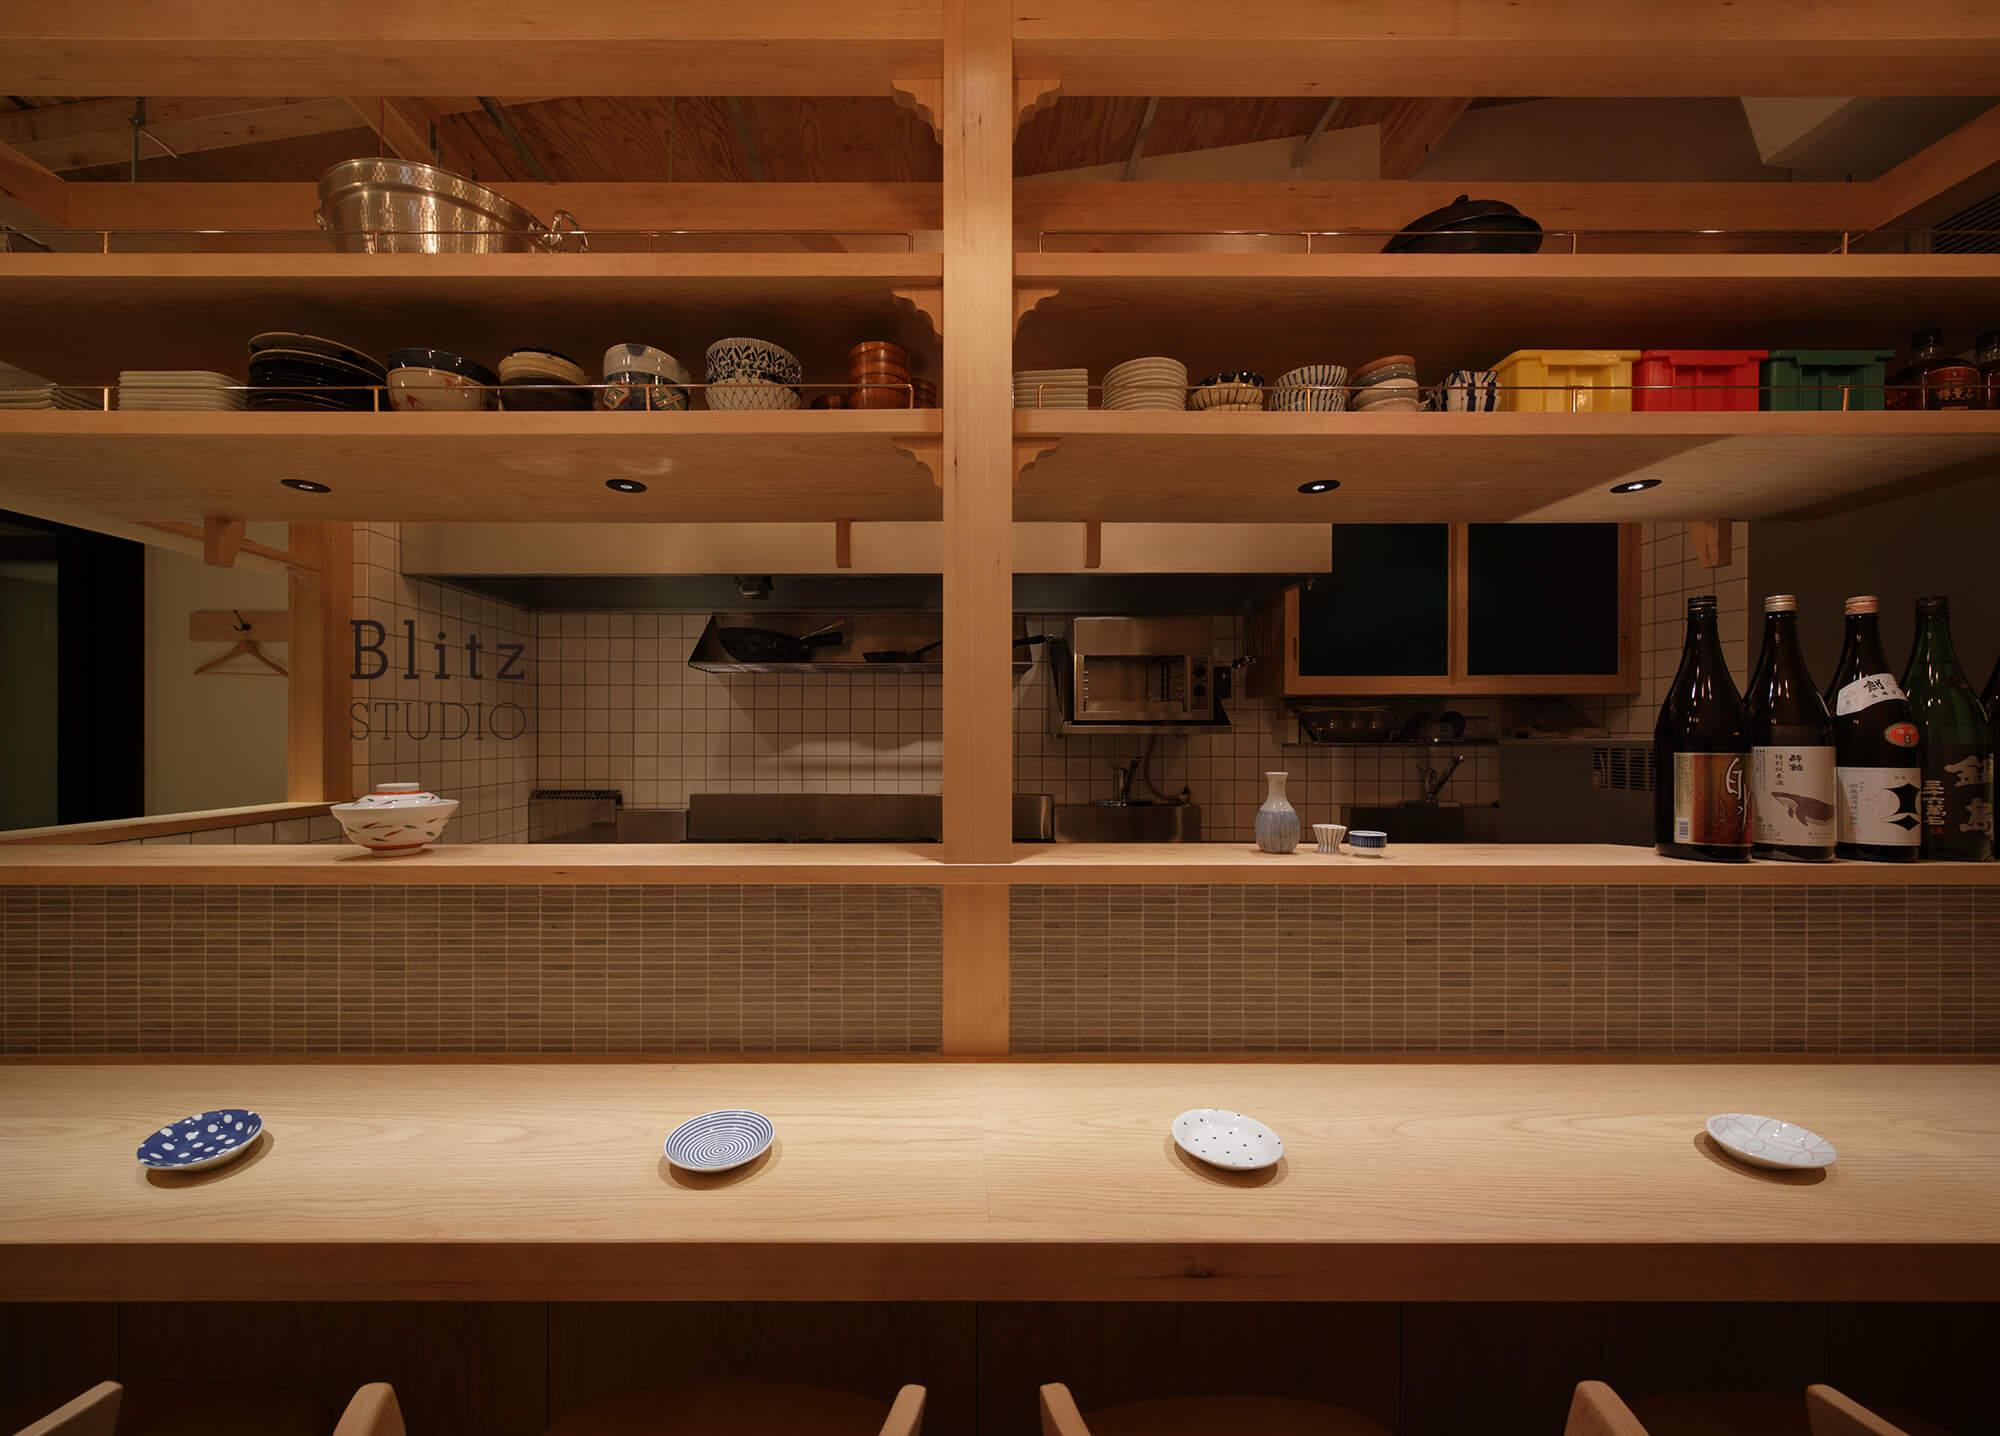 『チロル食堂』-福岡県福岡市-建築写真・竣工写真・インテリア写真4